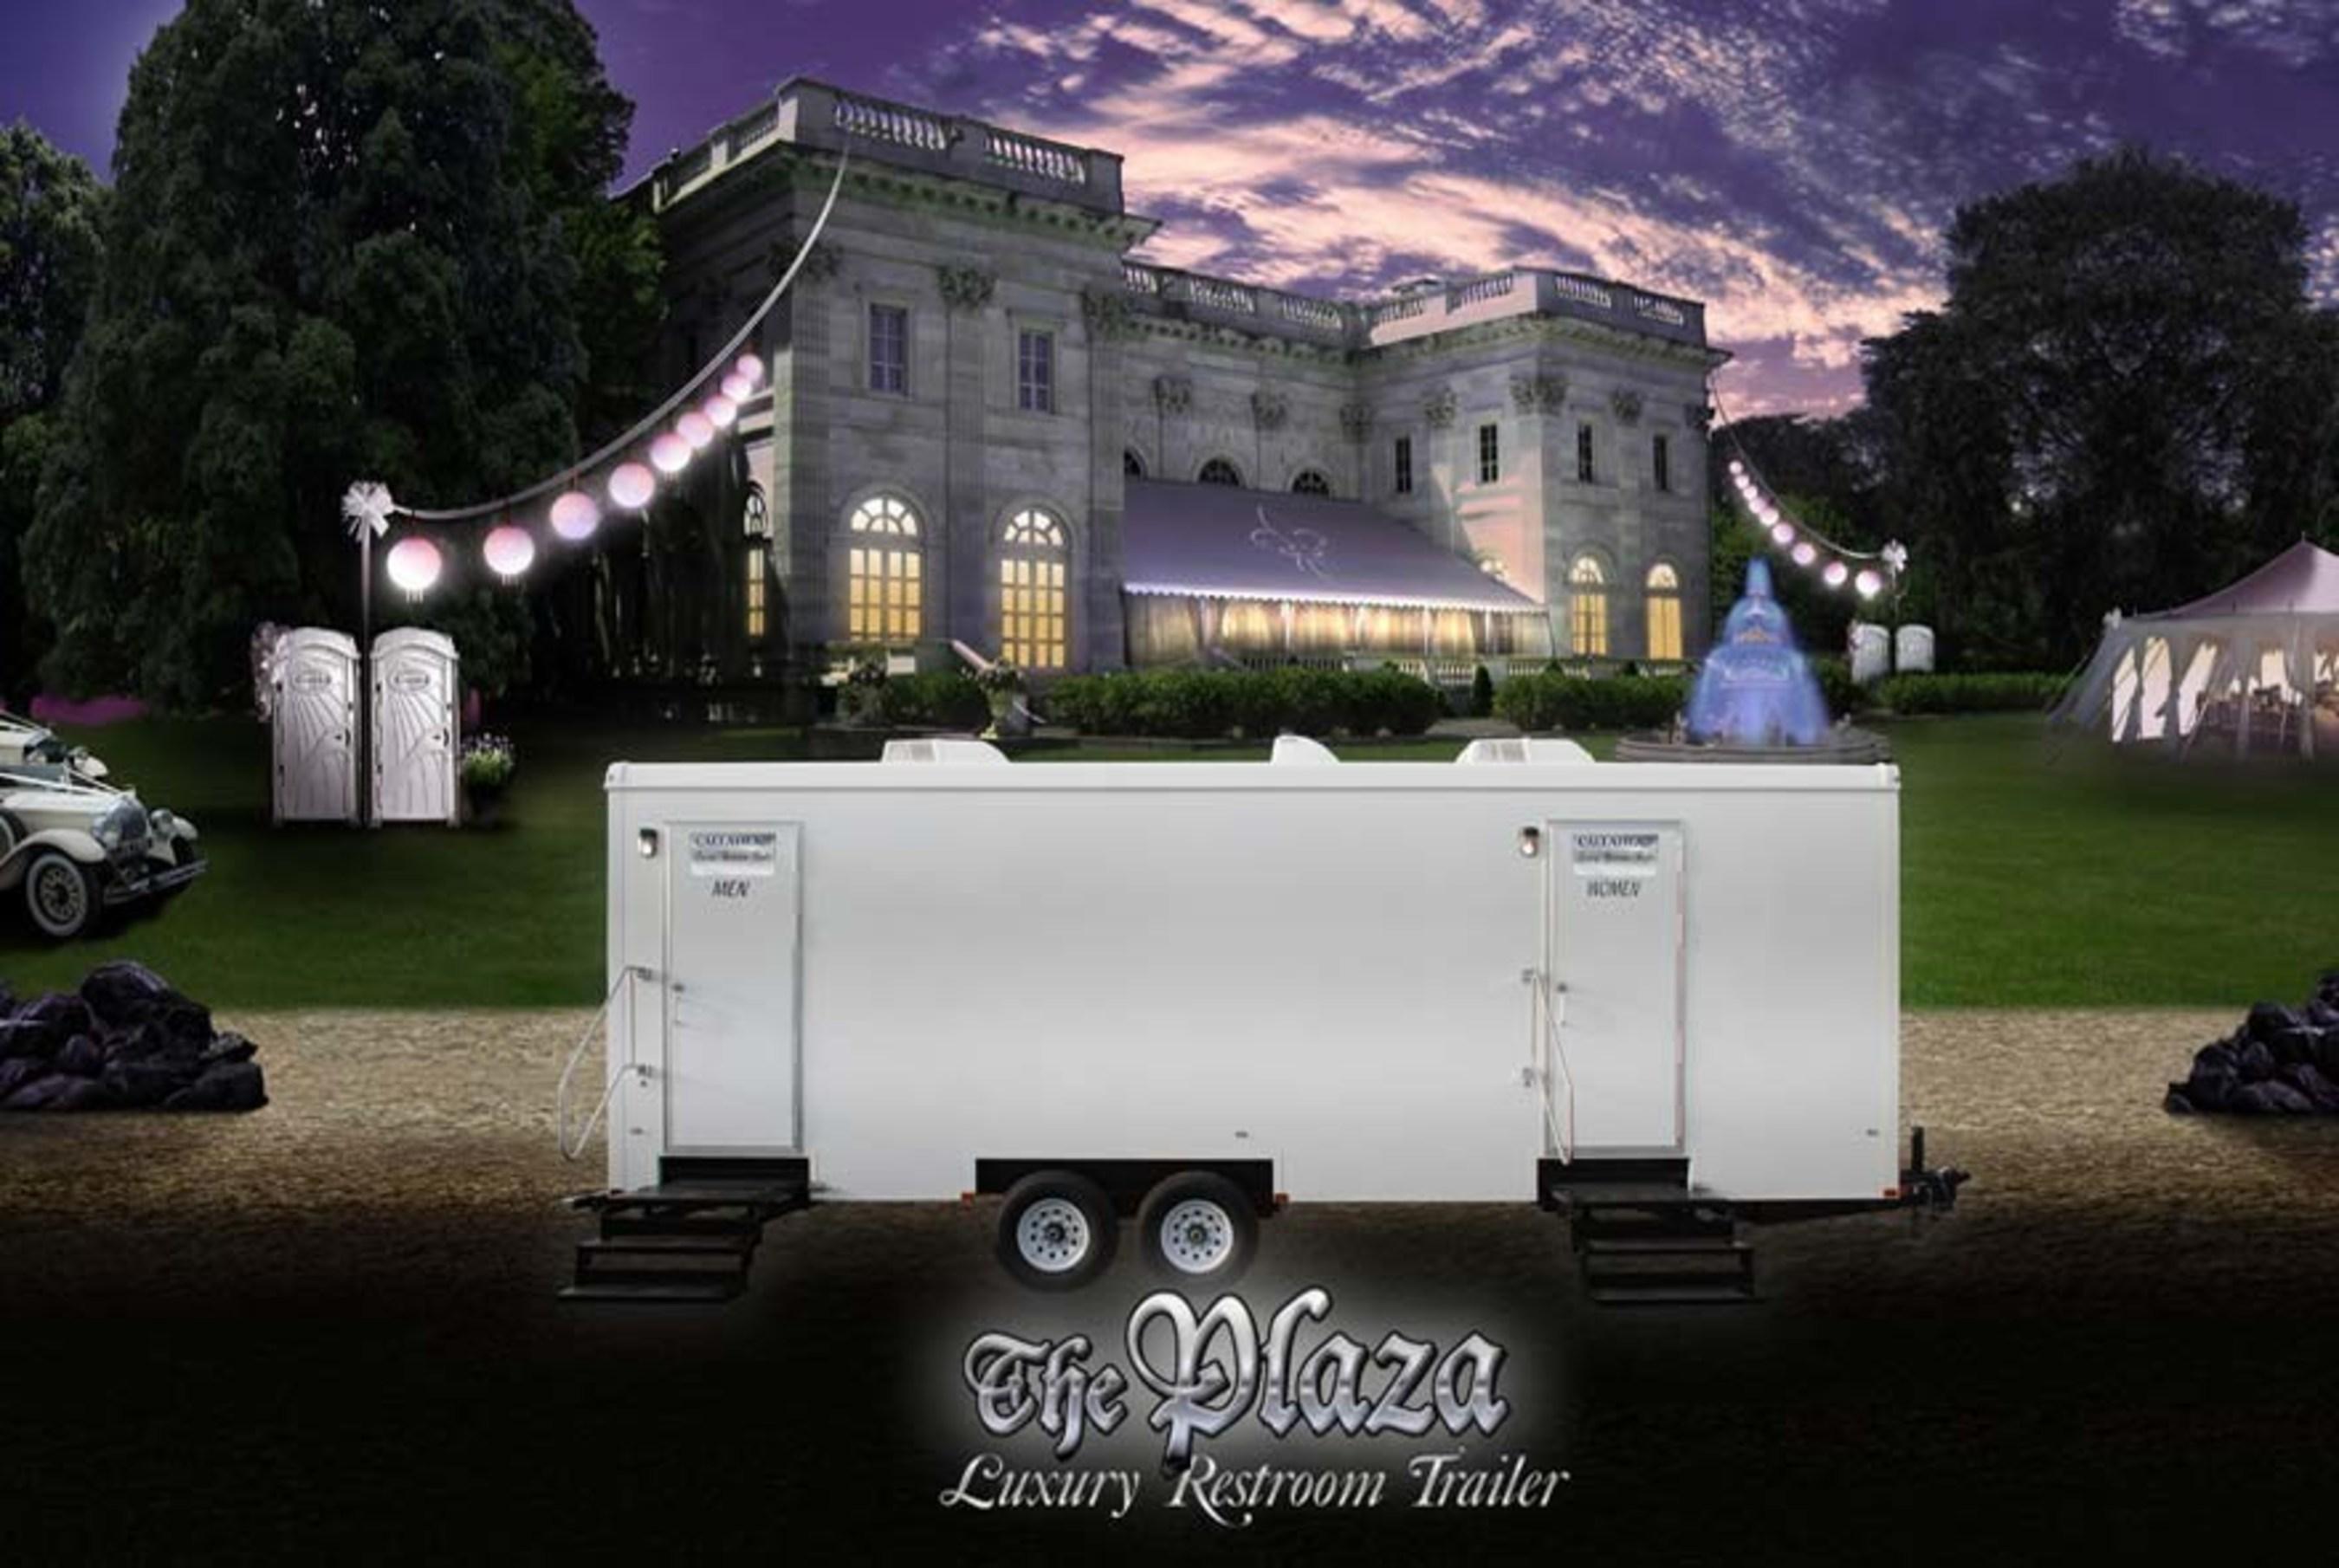 The Plaza Luxury Restroom Trailer